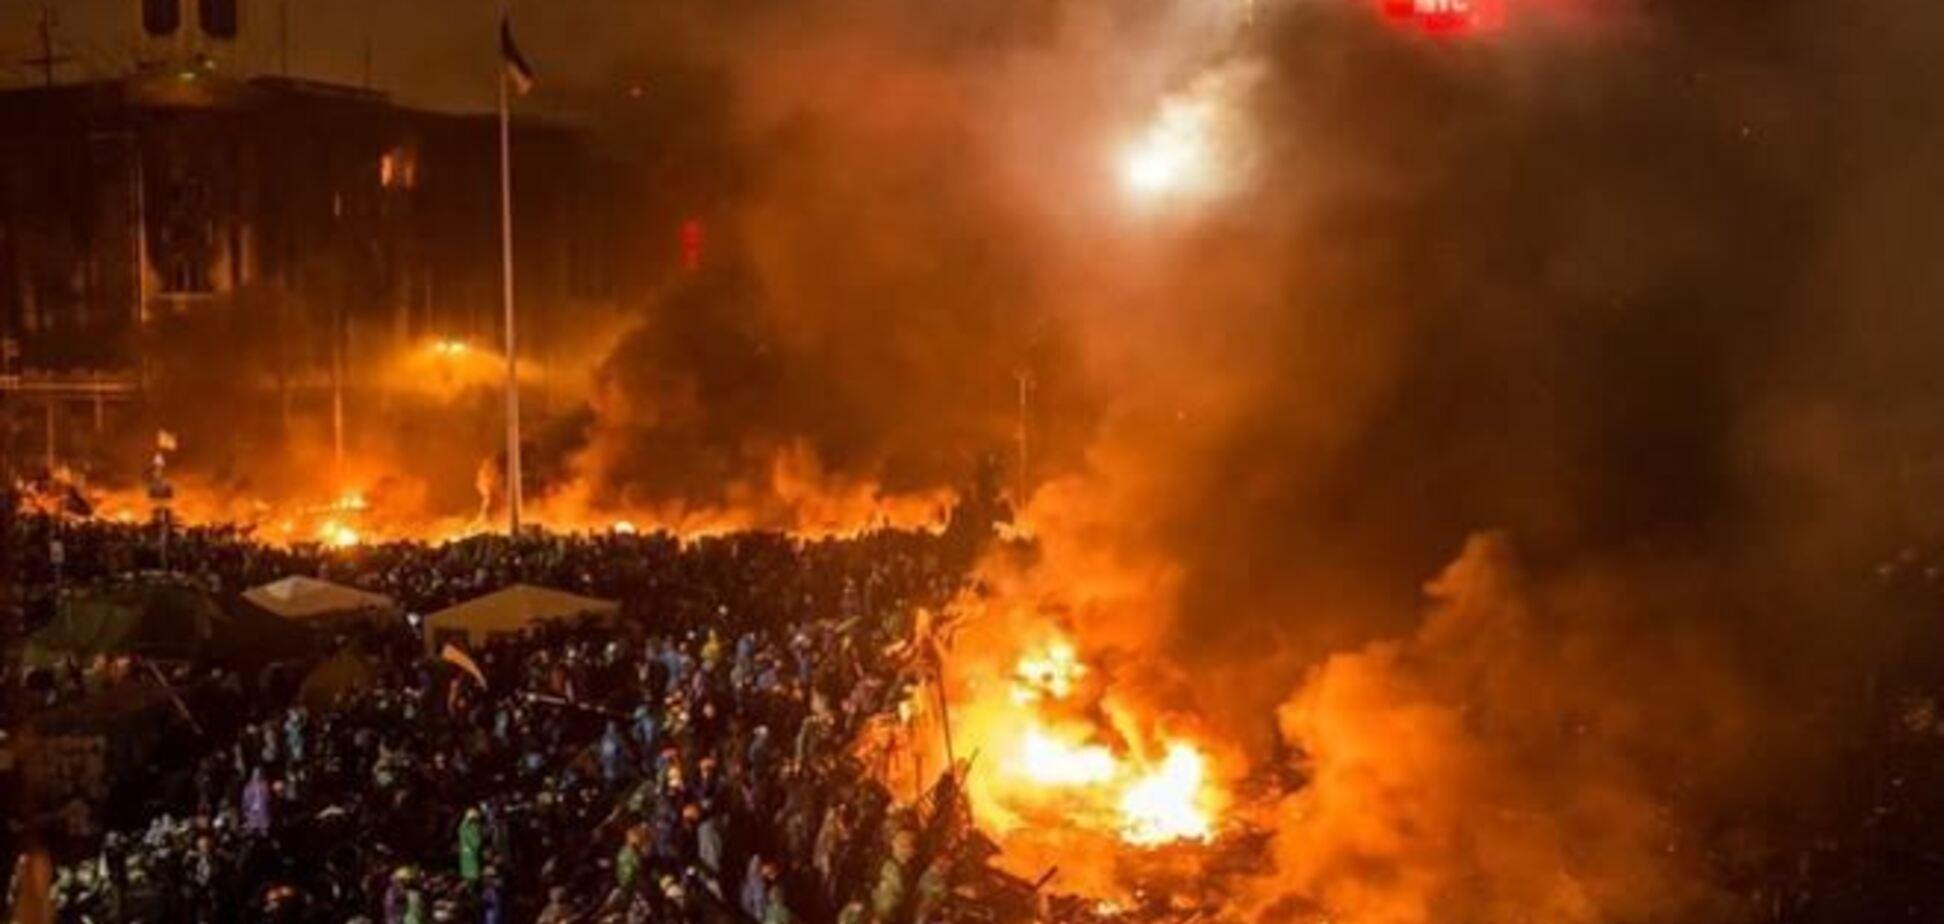 Москаль раскрыл план 'зачистки' Майдана. Документы